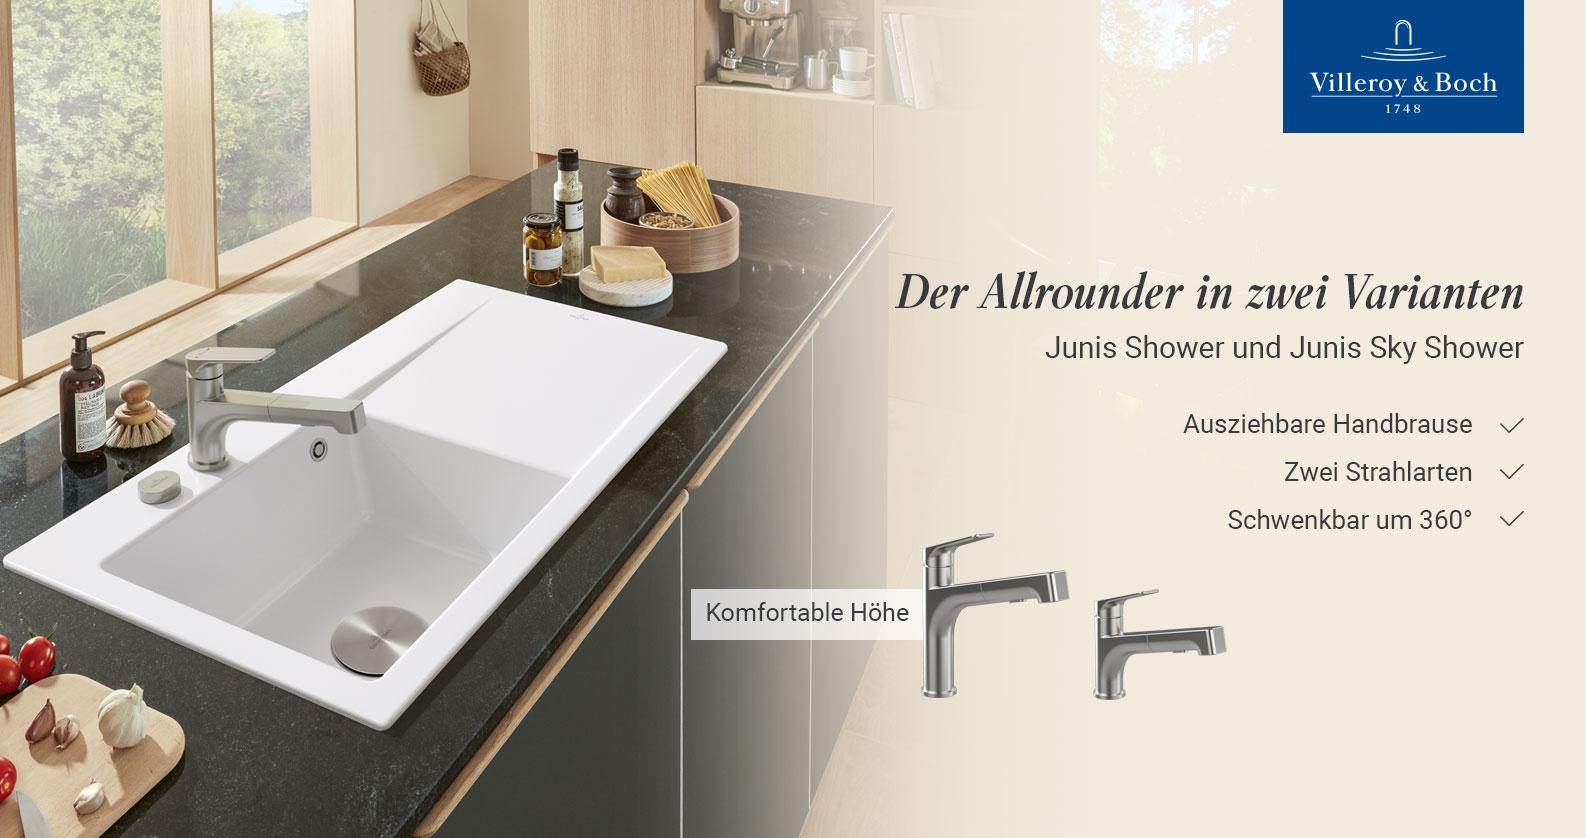 Villeroy & Boch Küchenarmaturen